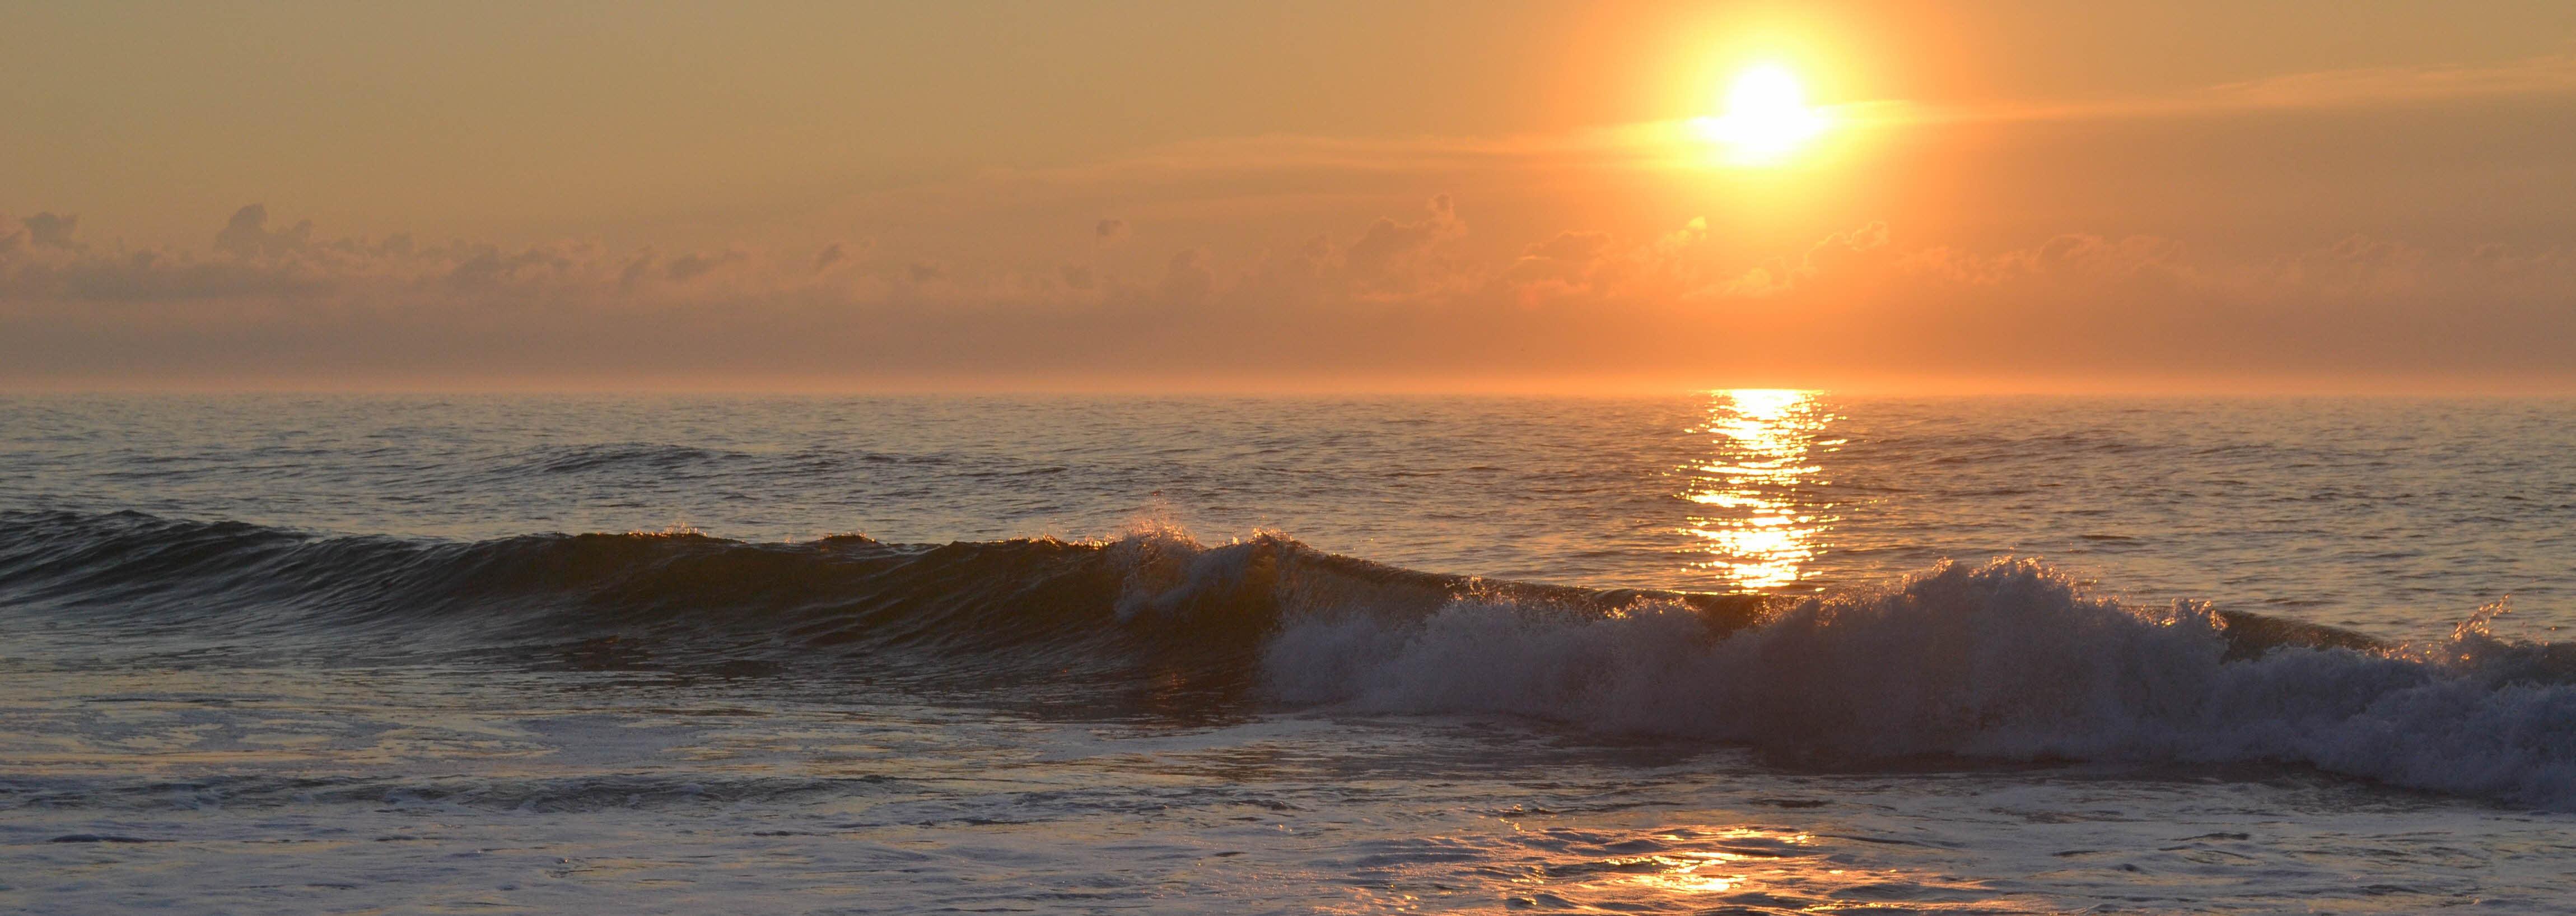 OBX-Sunrise